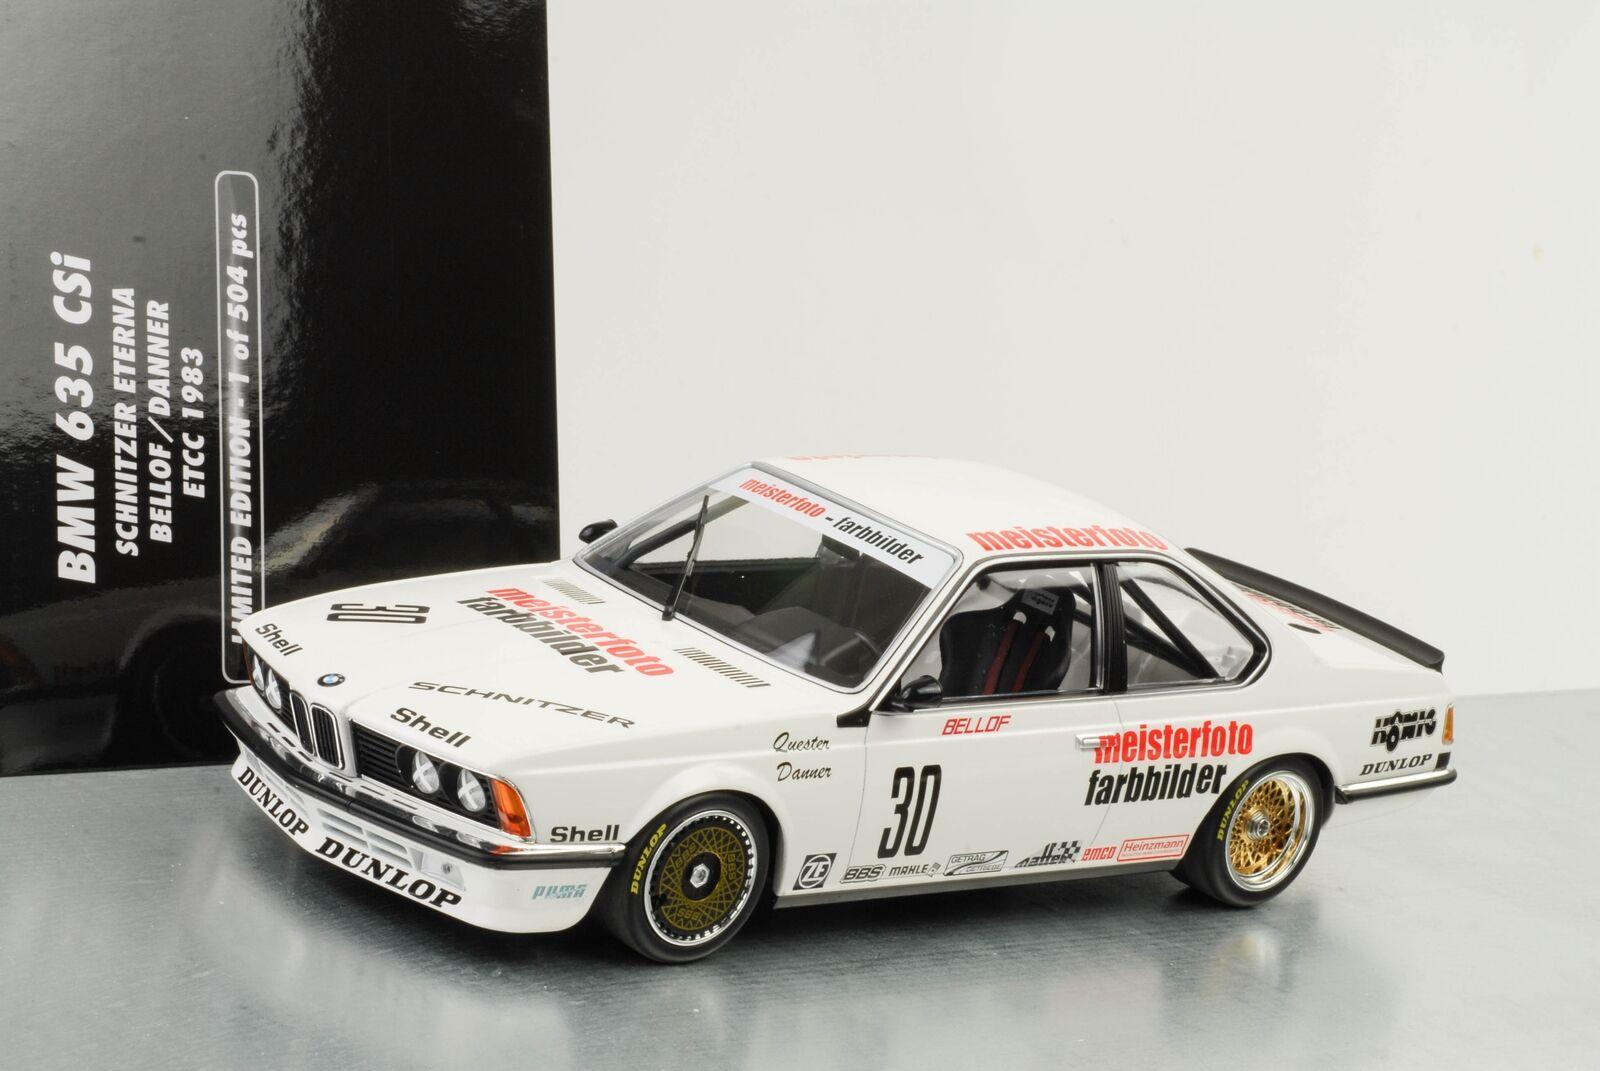 1983 BMW 635 CSI  30 ETCC Boulette Eterna Bellof Zolder 1 18 Minichamps